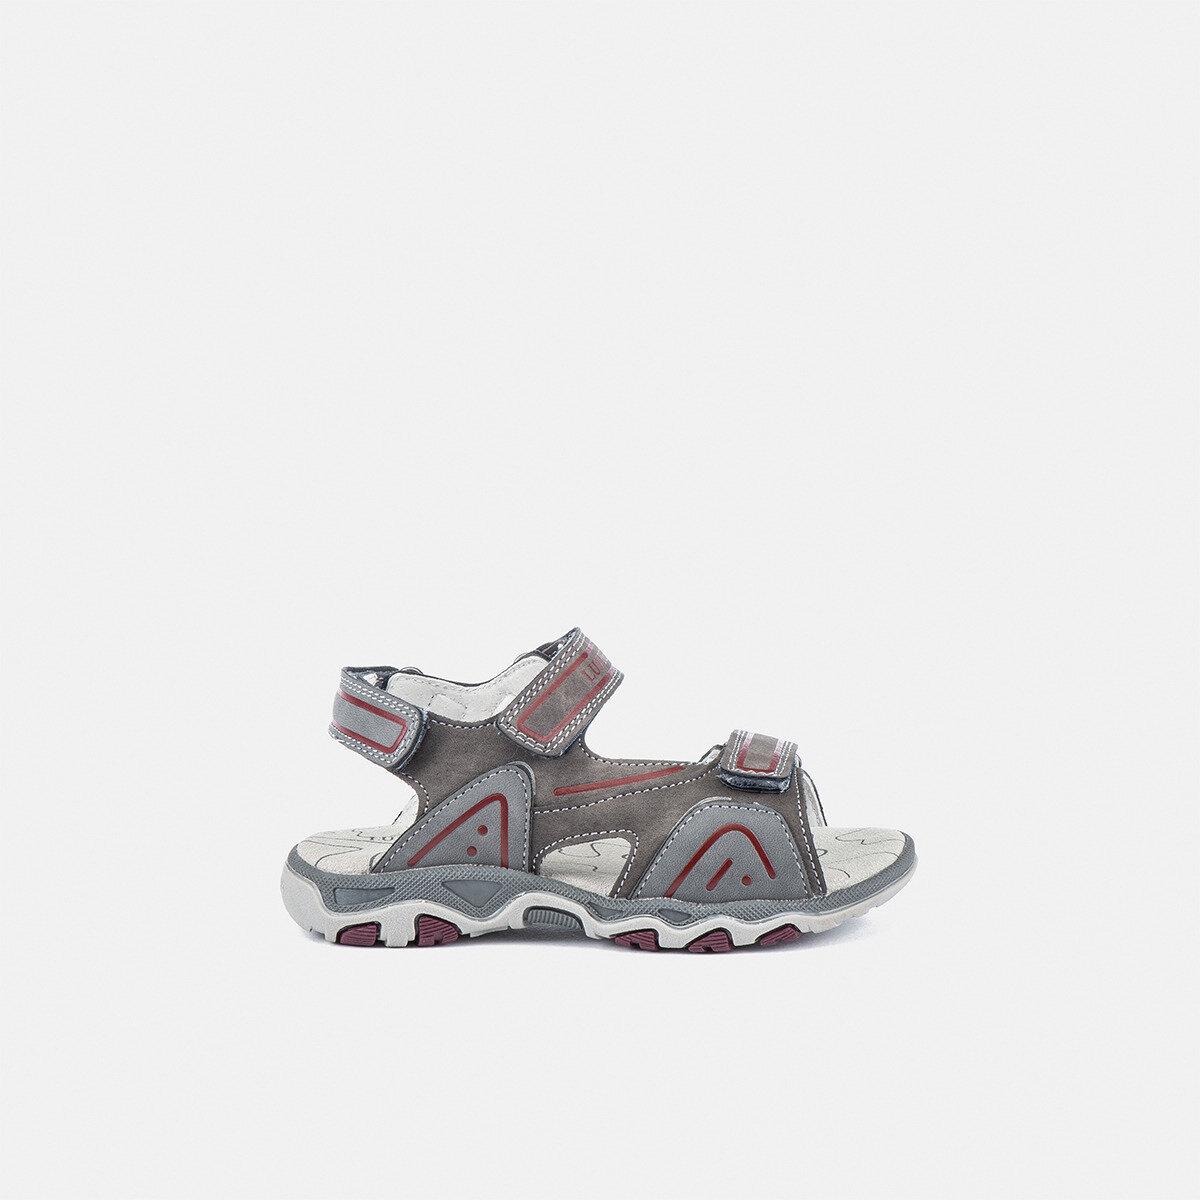 LEVI DK GREY/BORDEAUX Boy Sandals